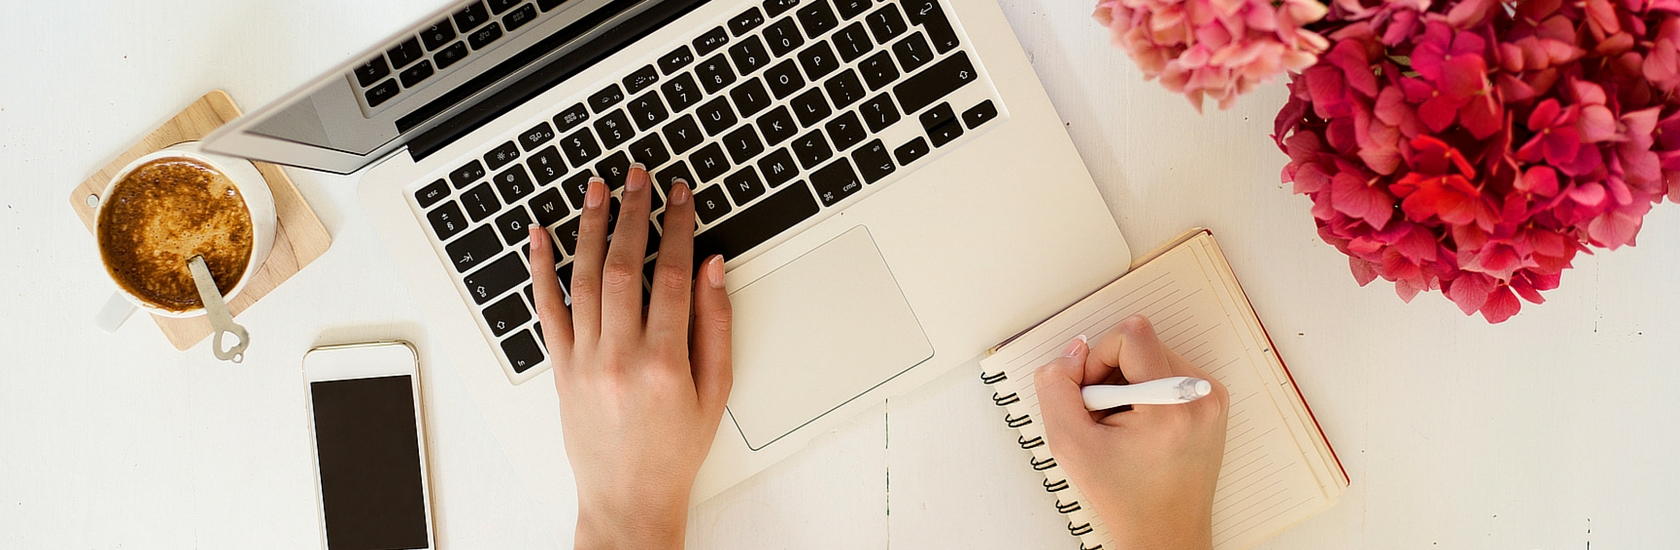 work with puzzle box communications, wordpress websites, www.puzzleboxcommunications.com